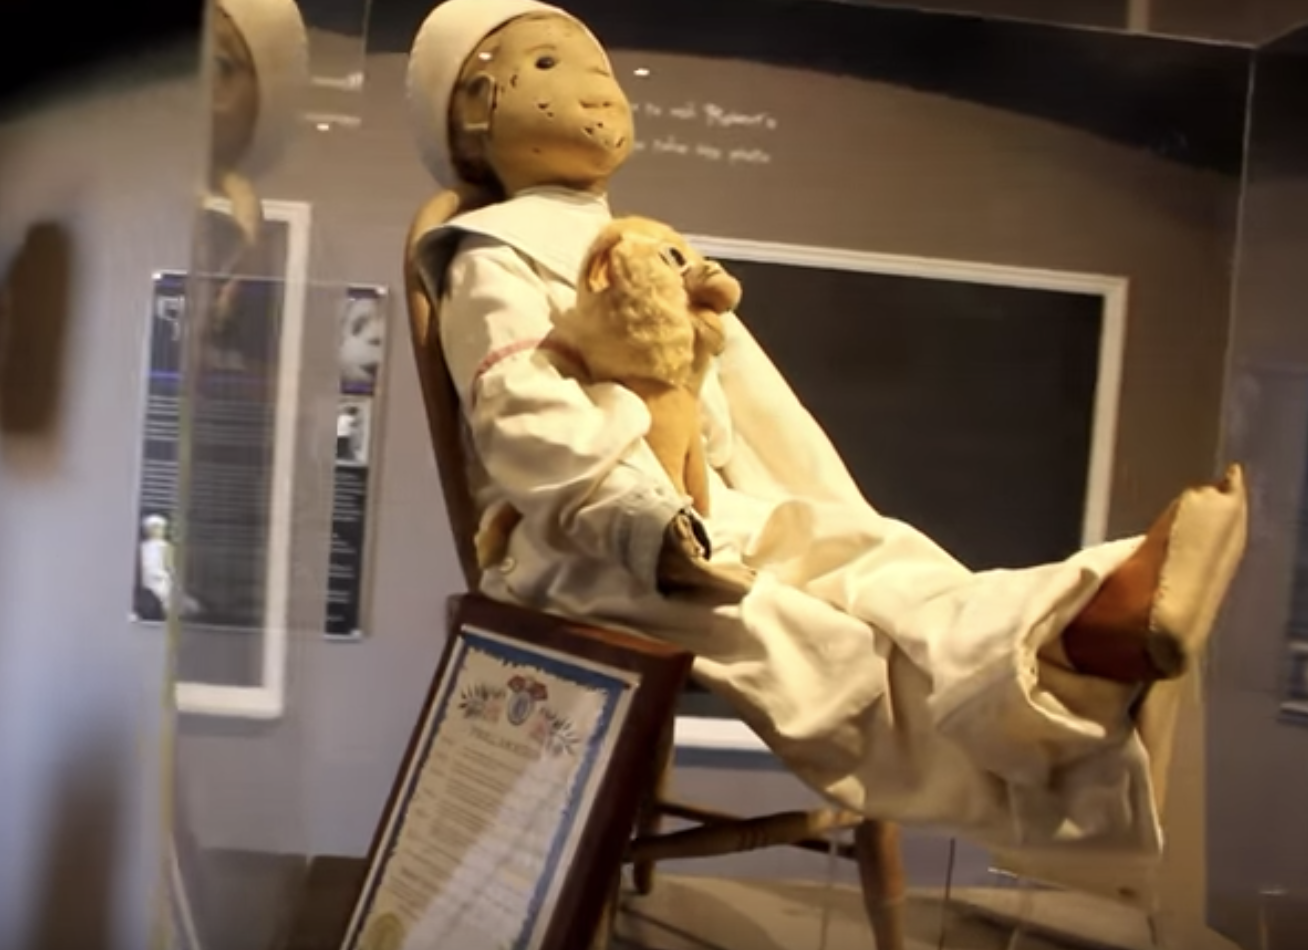 possessed doll